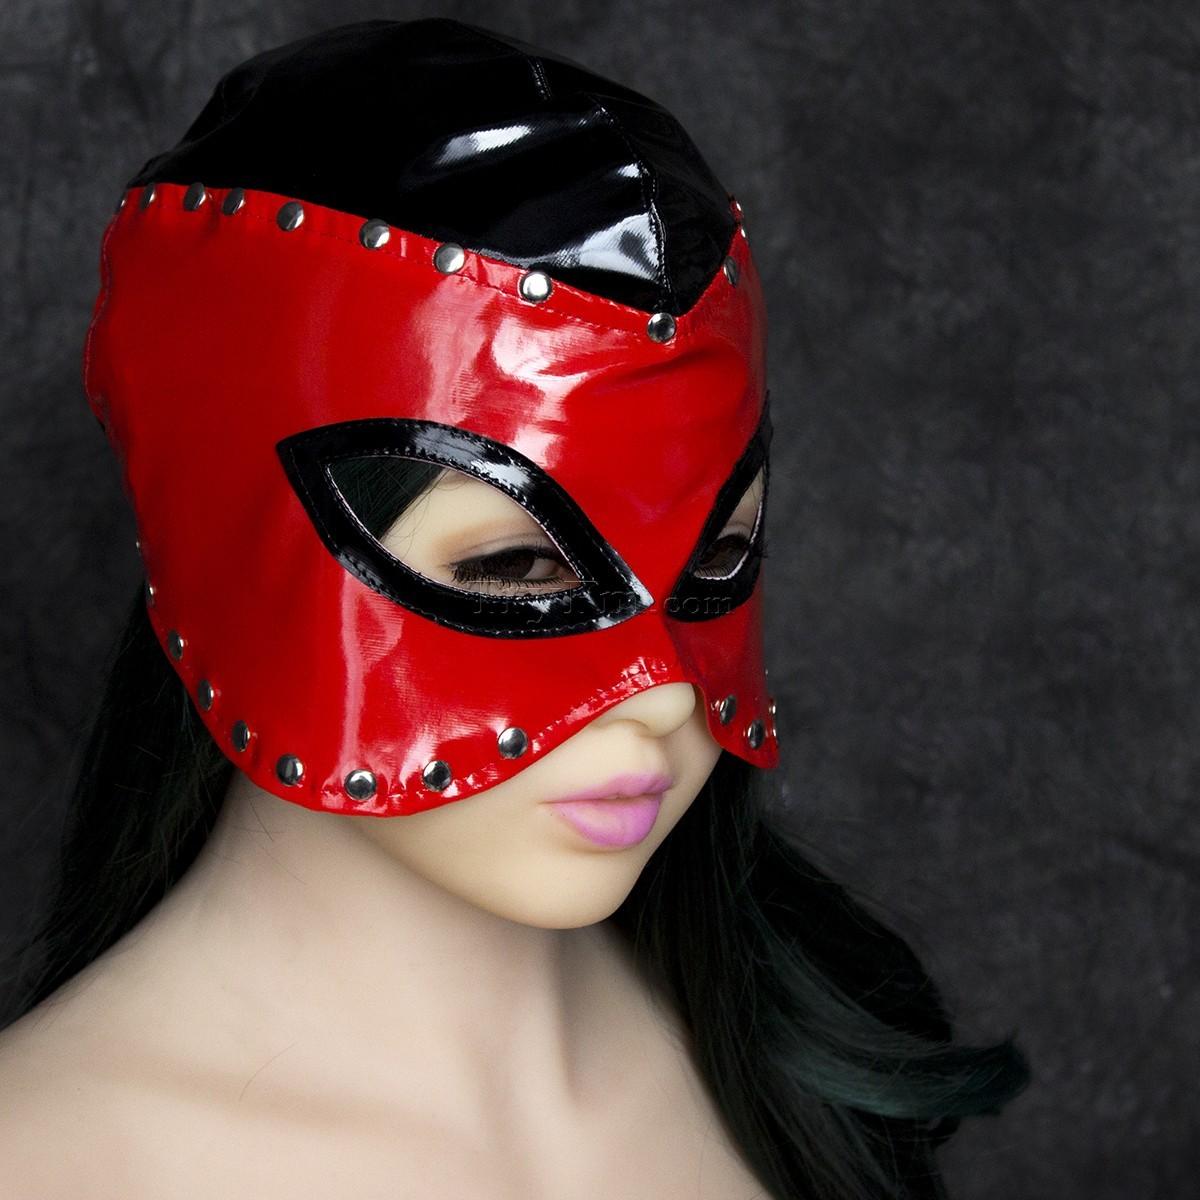 13-Masked-Queen-Cap.jpg